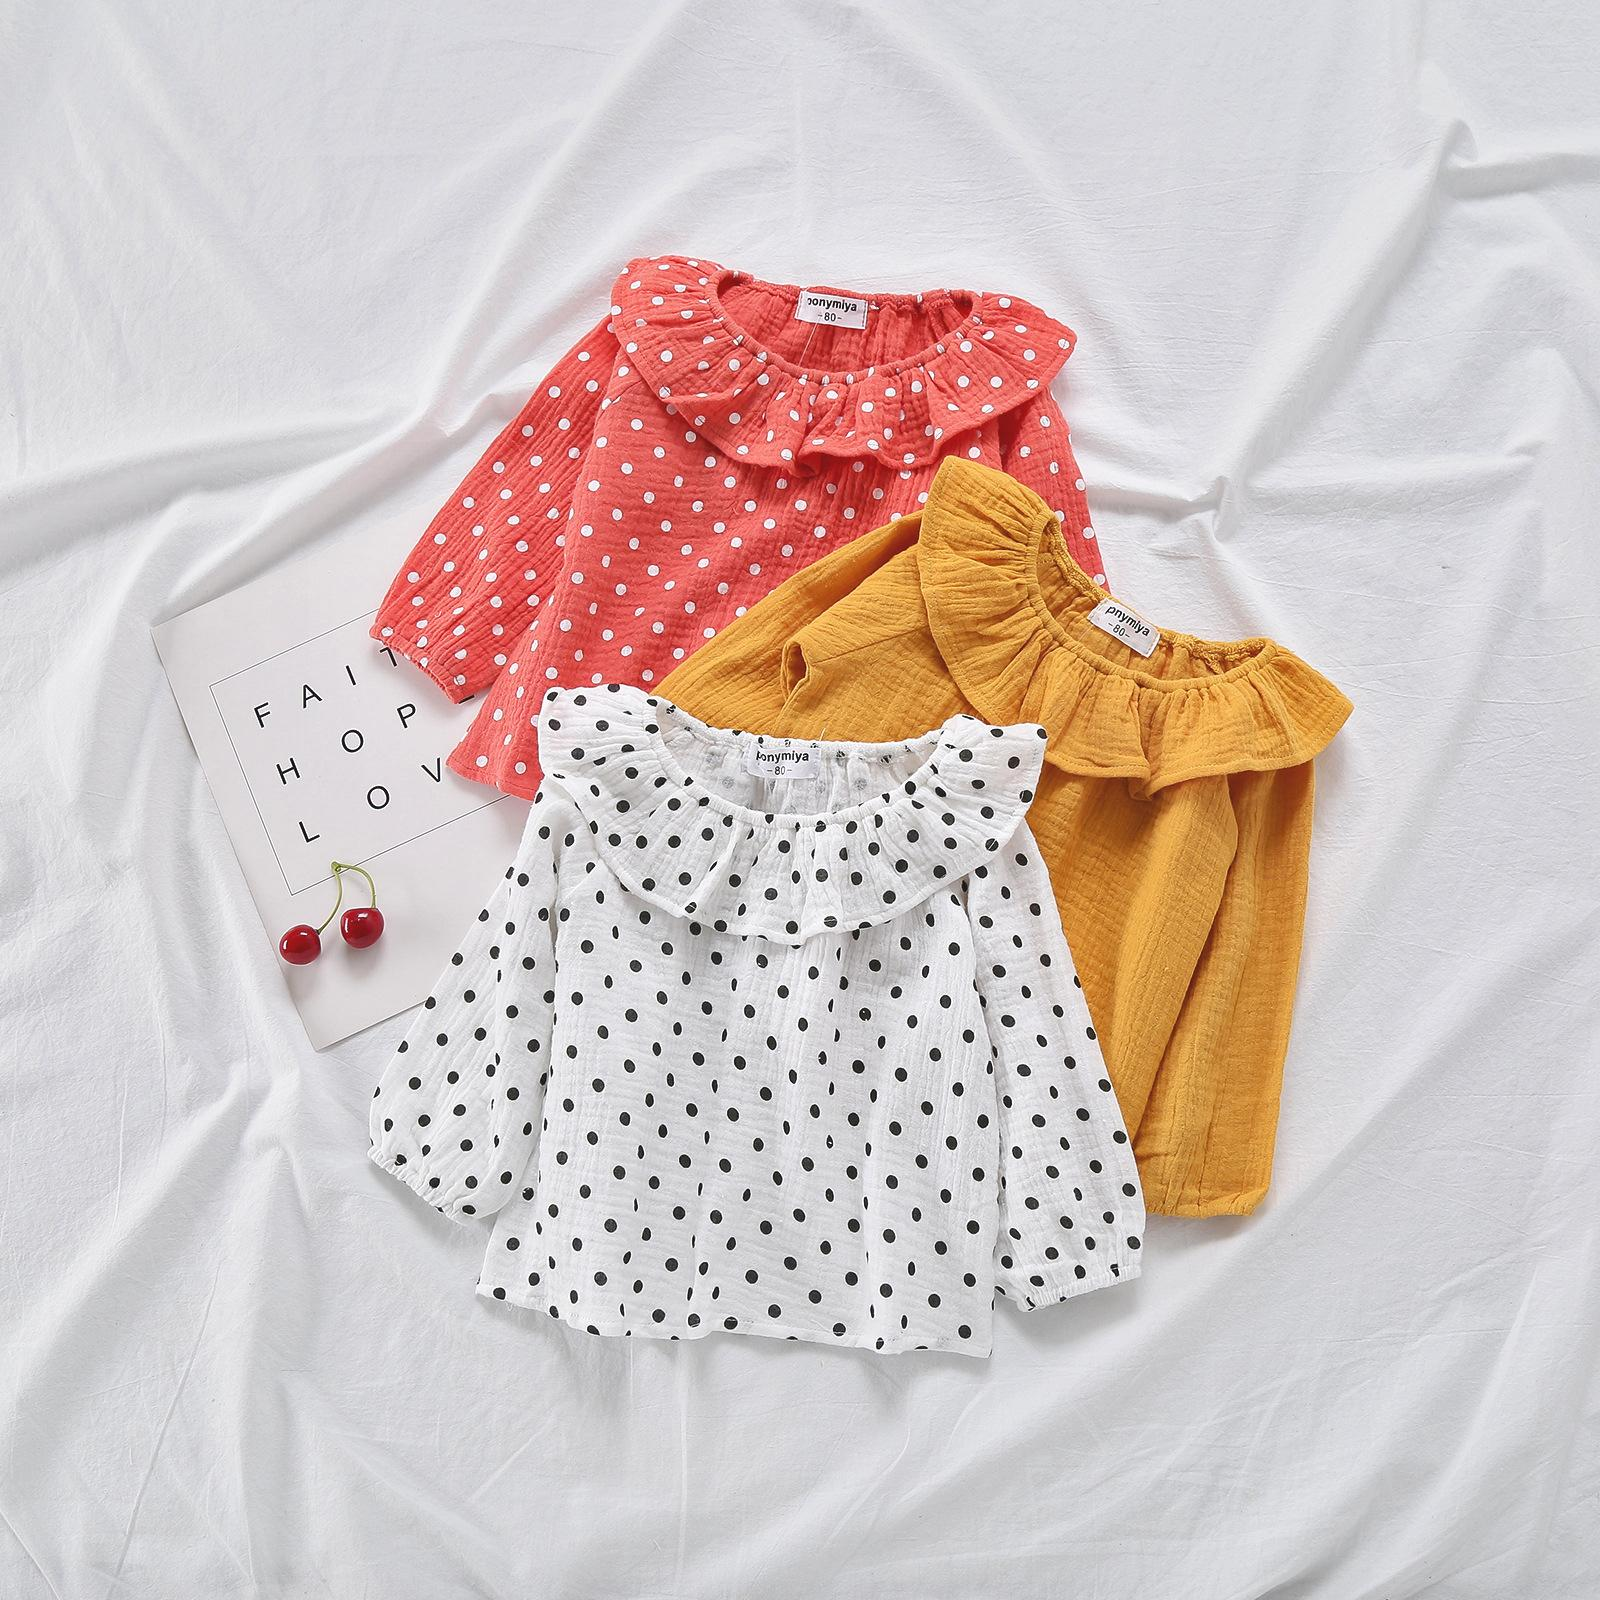 beb0b4406 2019 2019 Autumn New Girls Clothes Linen Cotton Long Sleeve Shirts Peter  Pan Collar Baby Girl Princess Blouse Toddler Tops Dot Blouse From  Textgoods08, ...